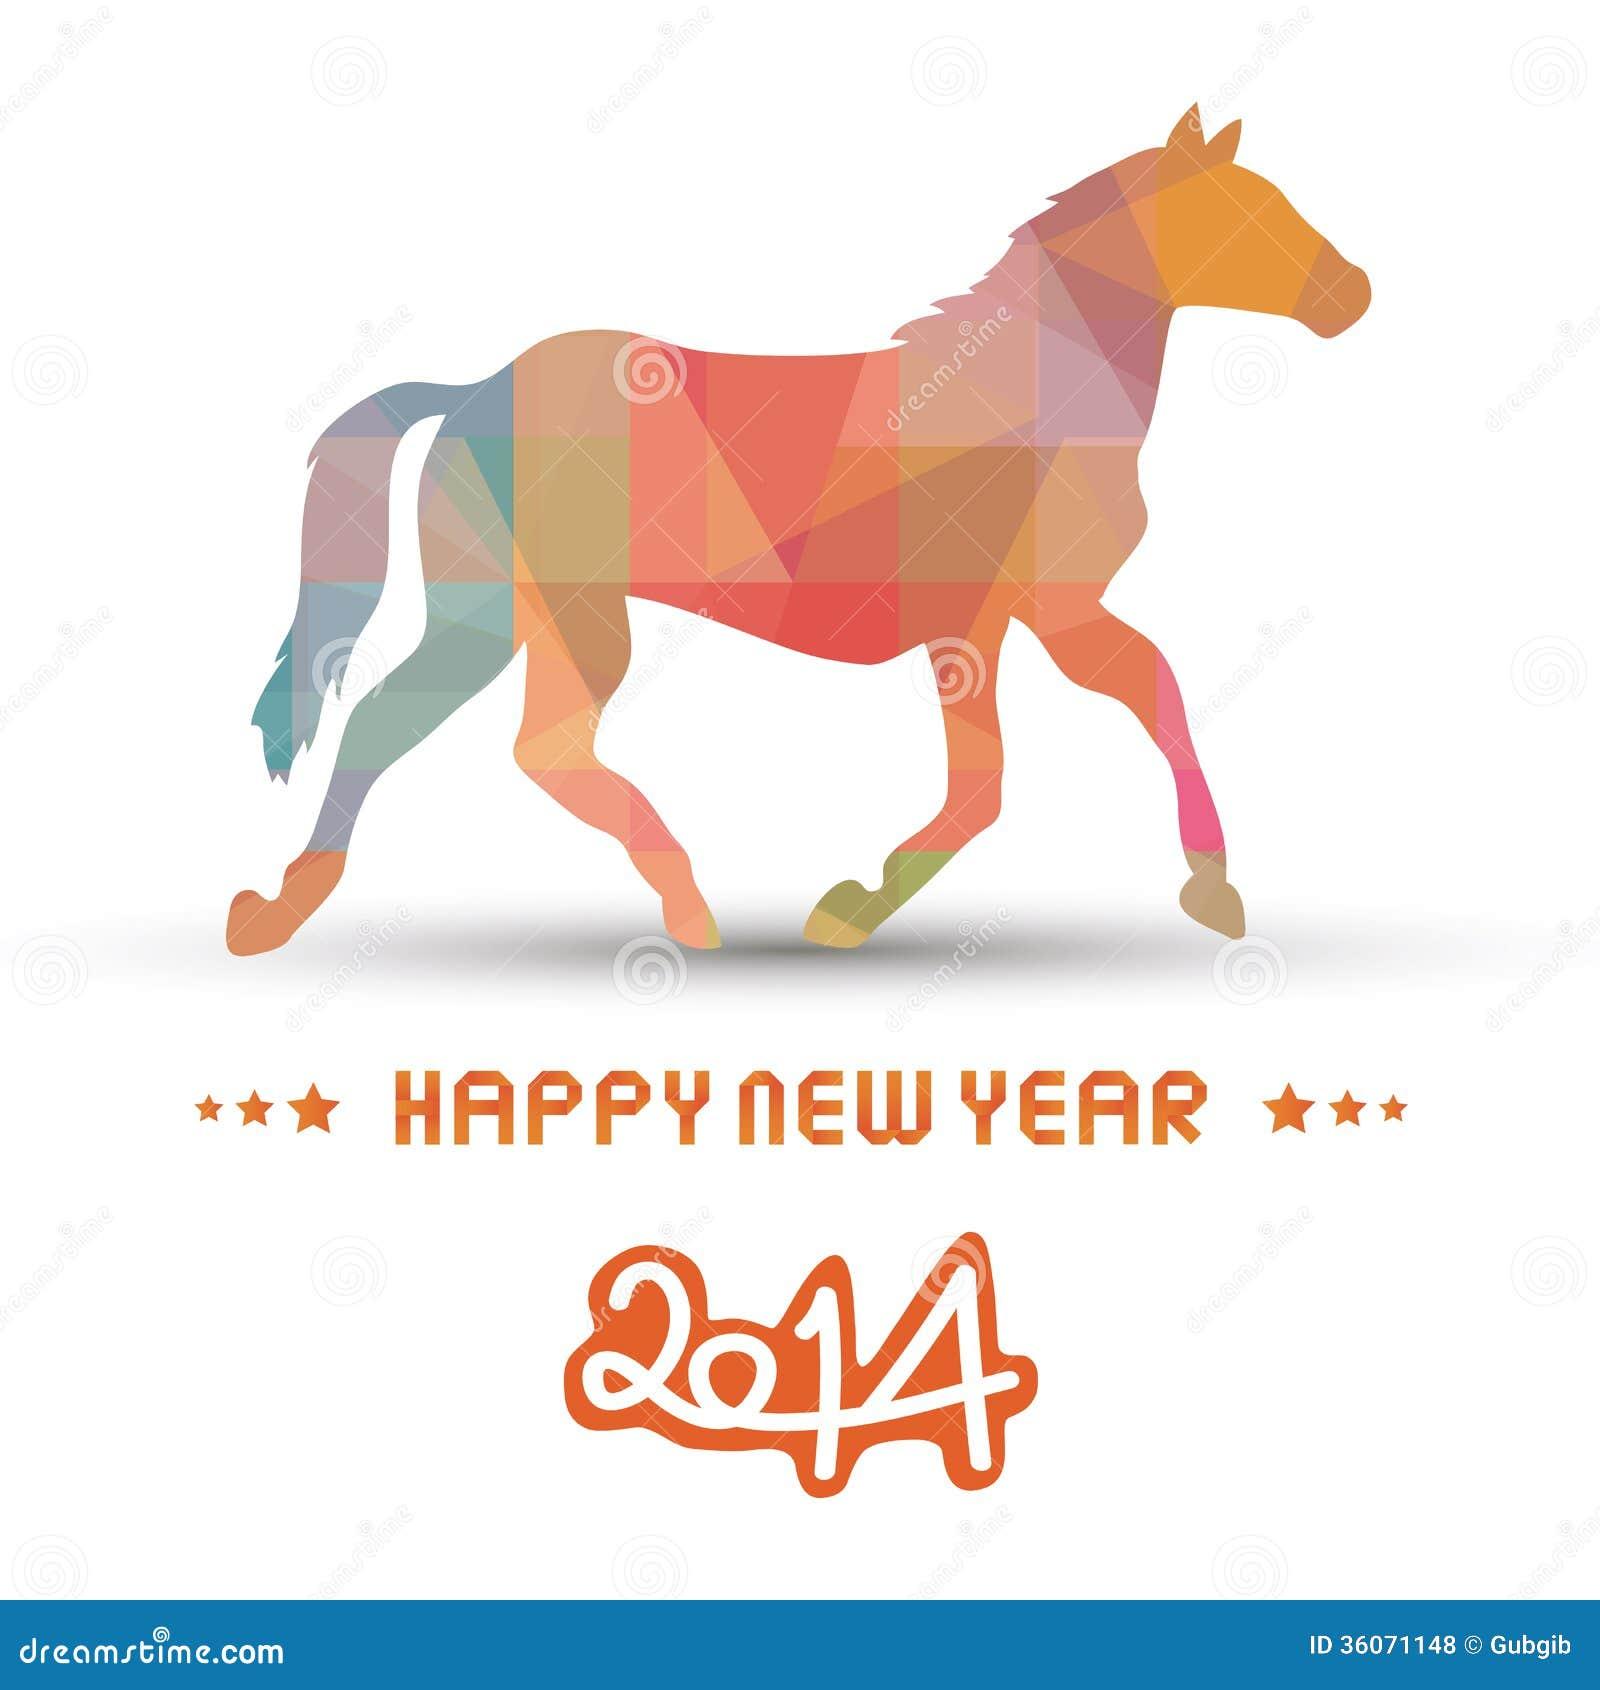 Happy new year 2014 card20 stock vector. Image of season ...